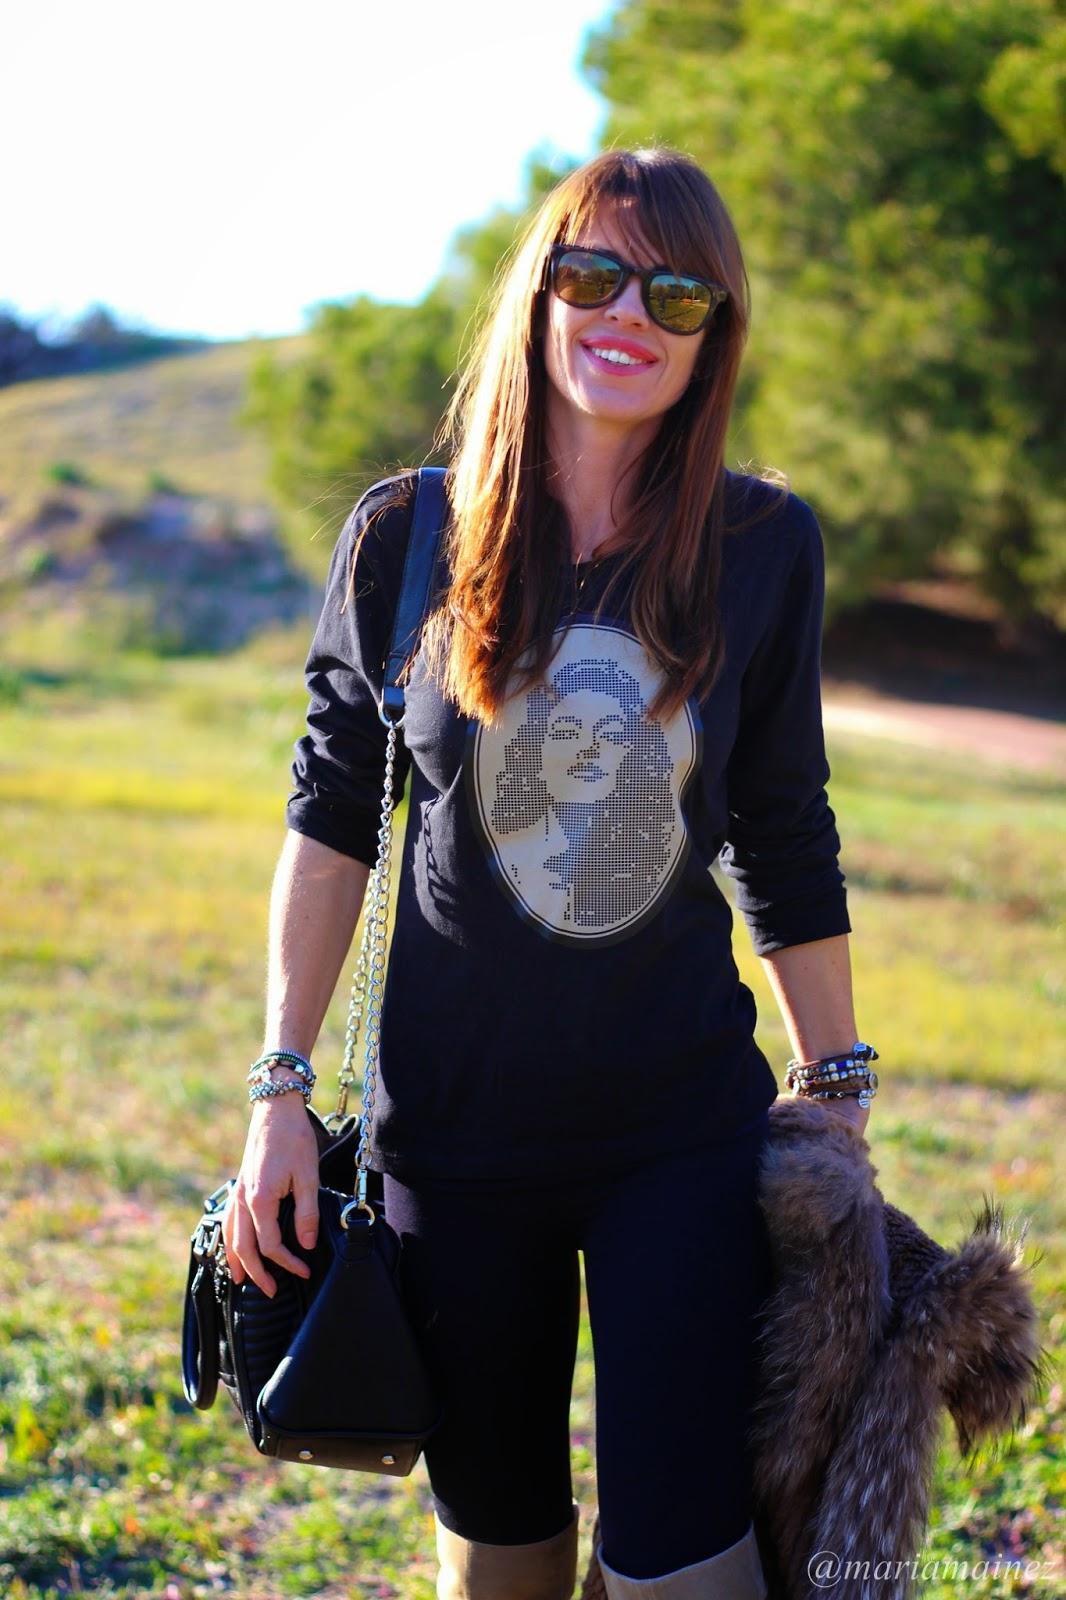 Negro + camel - Outfit invierno 2014/15 - Chaleco pelo, botas UTK - Buffalo London- Cuchicuchi pulseras